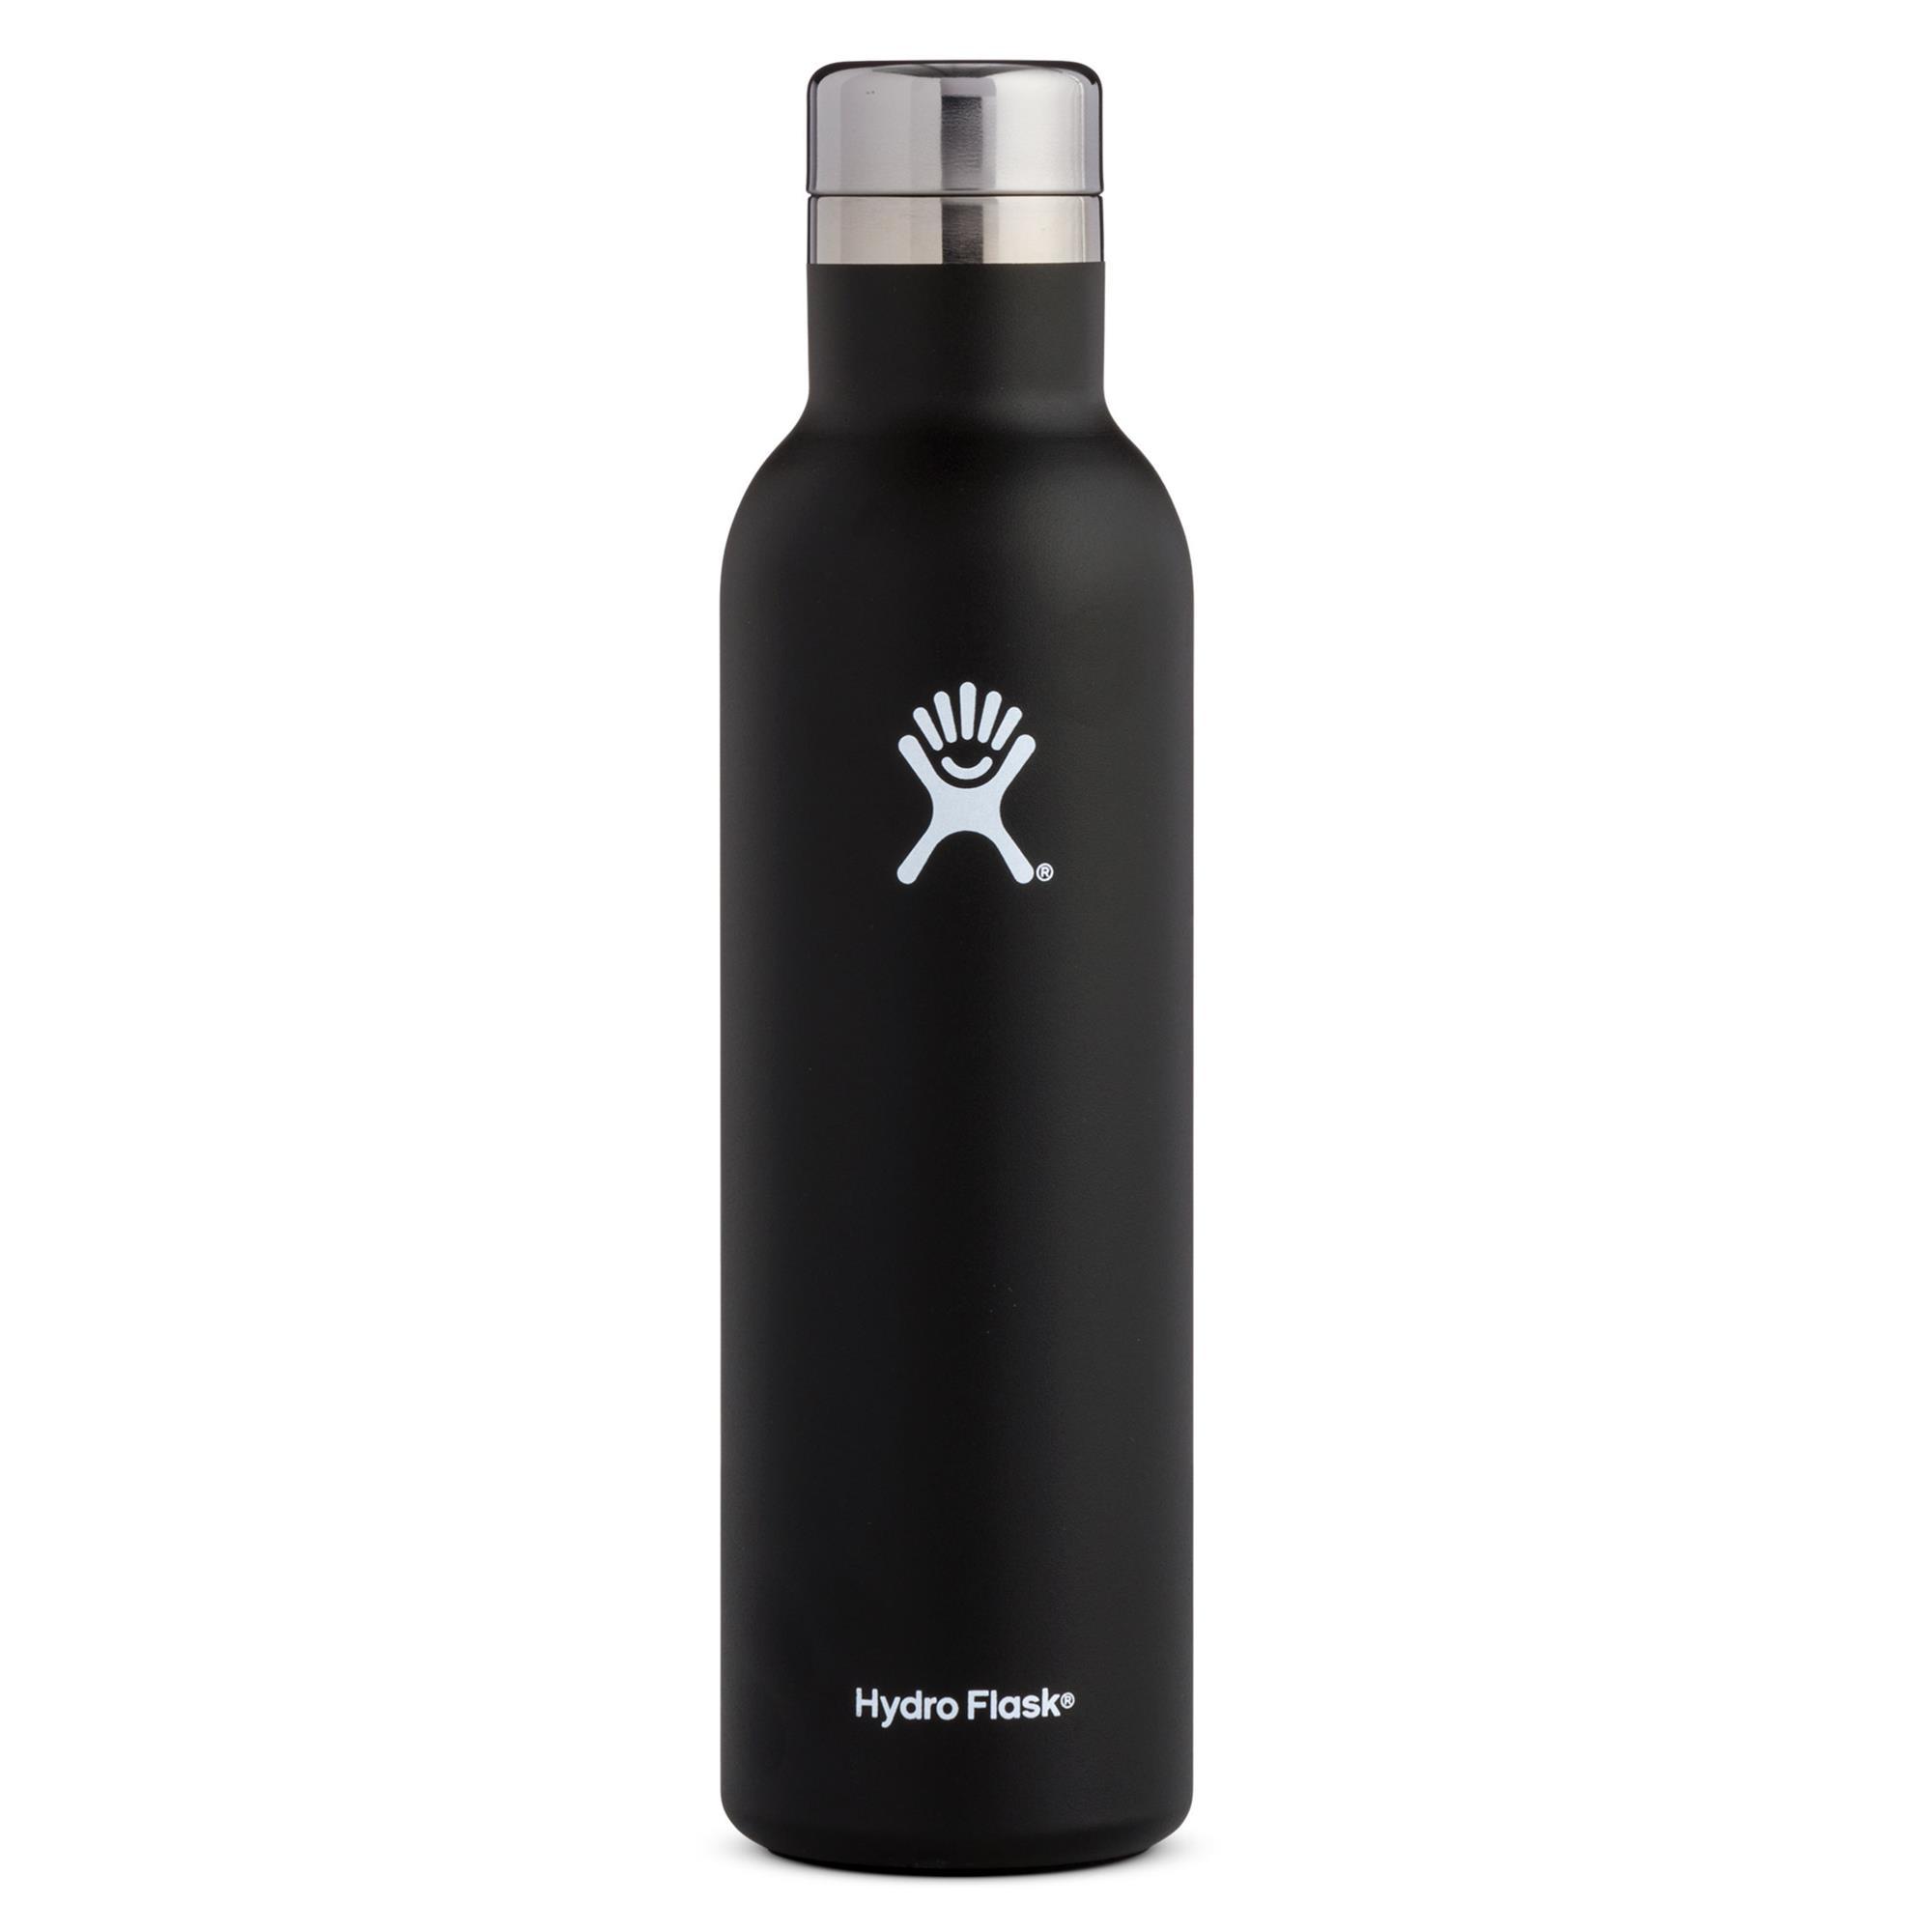 Hydro Flask® 25 oz Wine Bottle Thermosbecher sc...